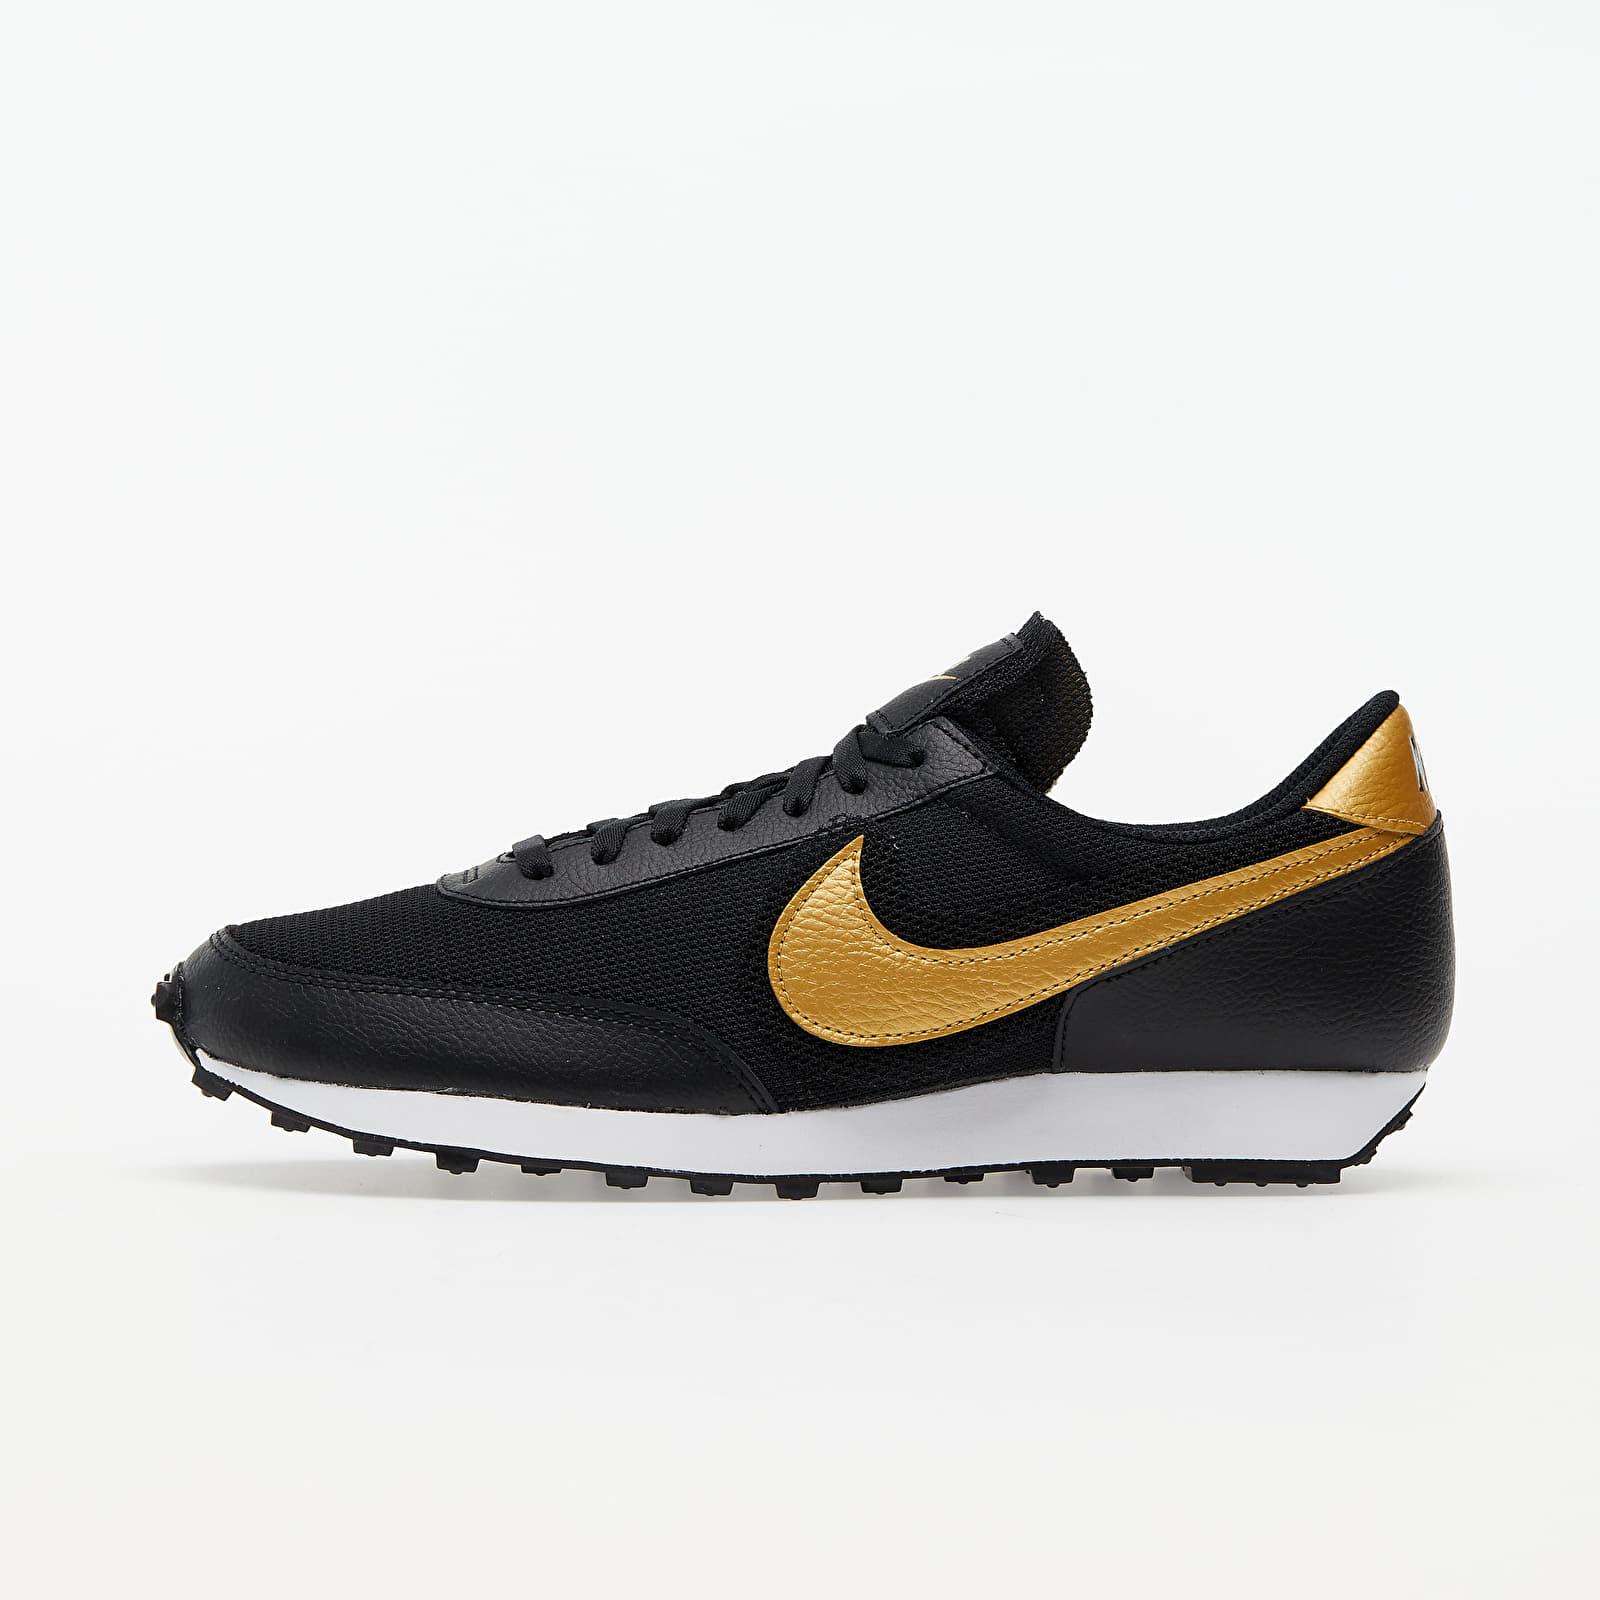 Women's shoes Nike Wmns Daybreak Black/ Black-Metallic Gold-White